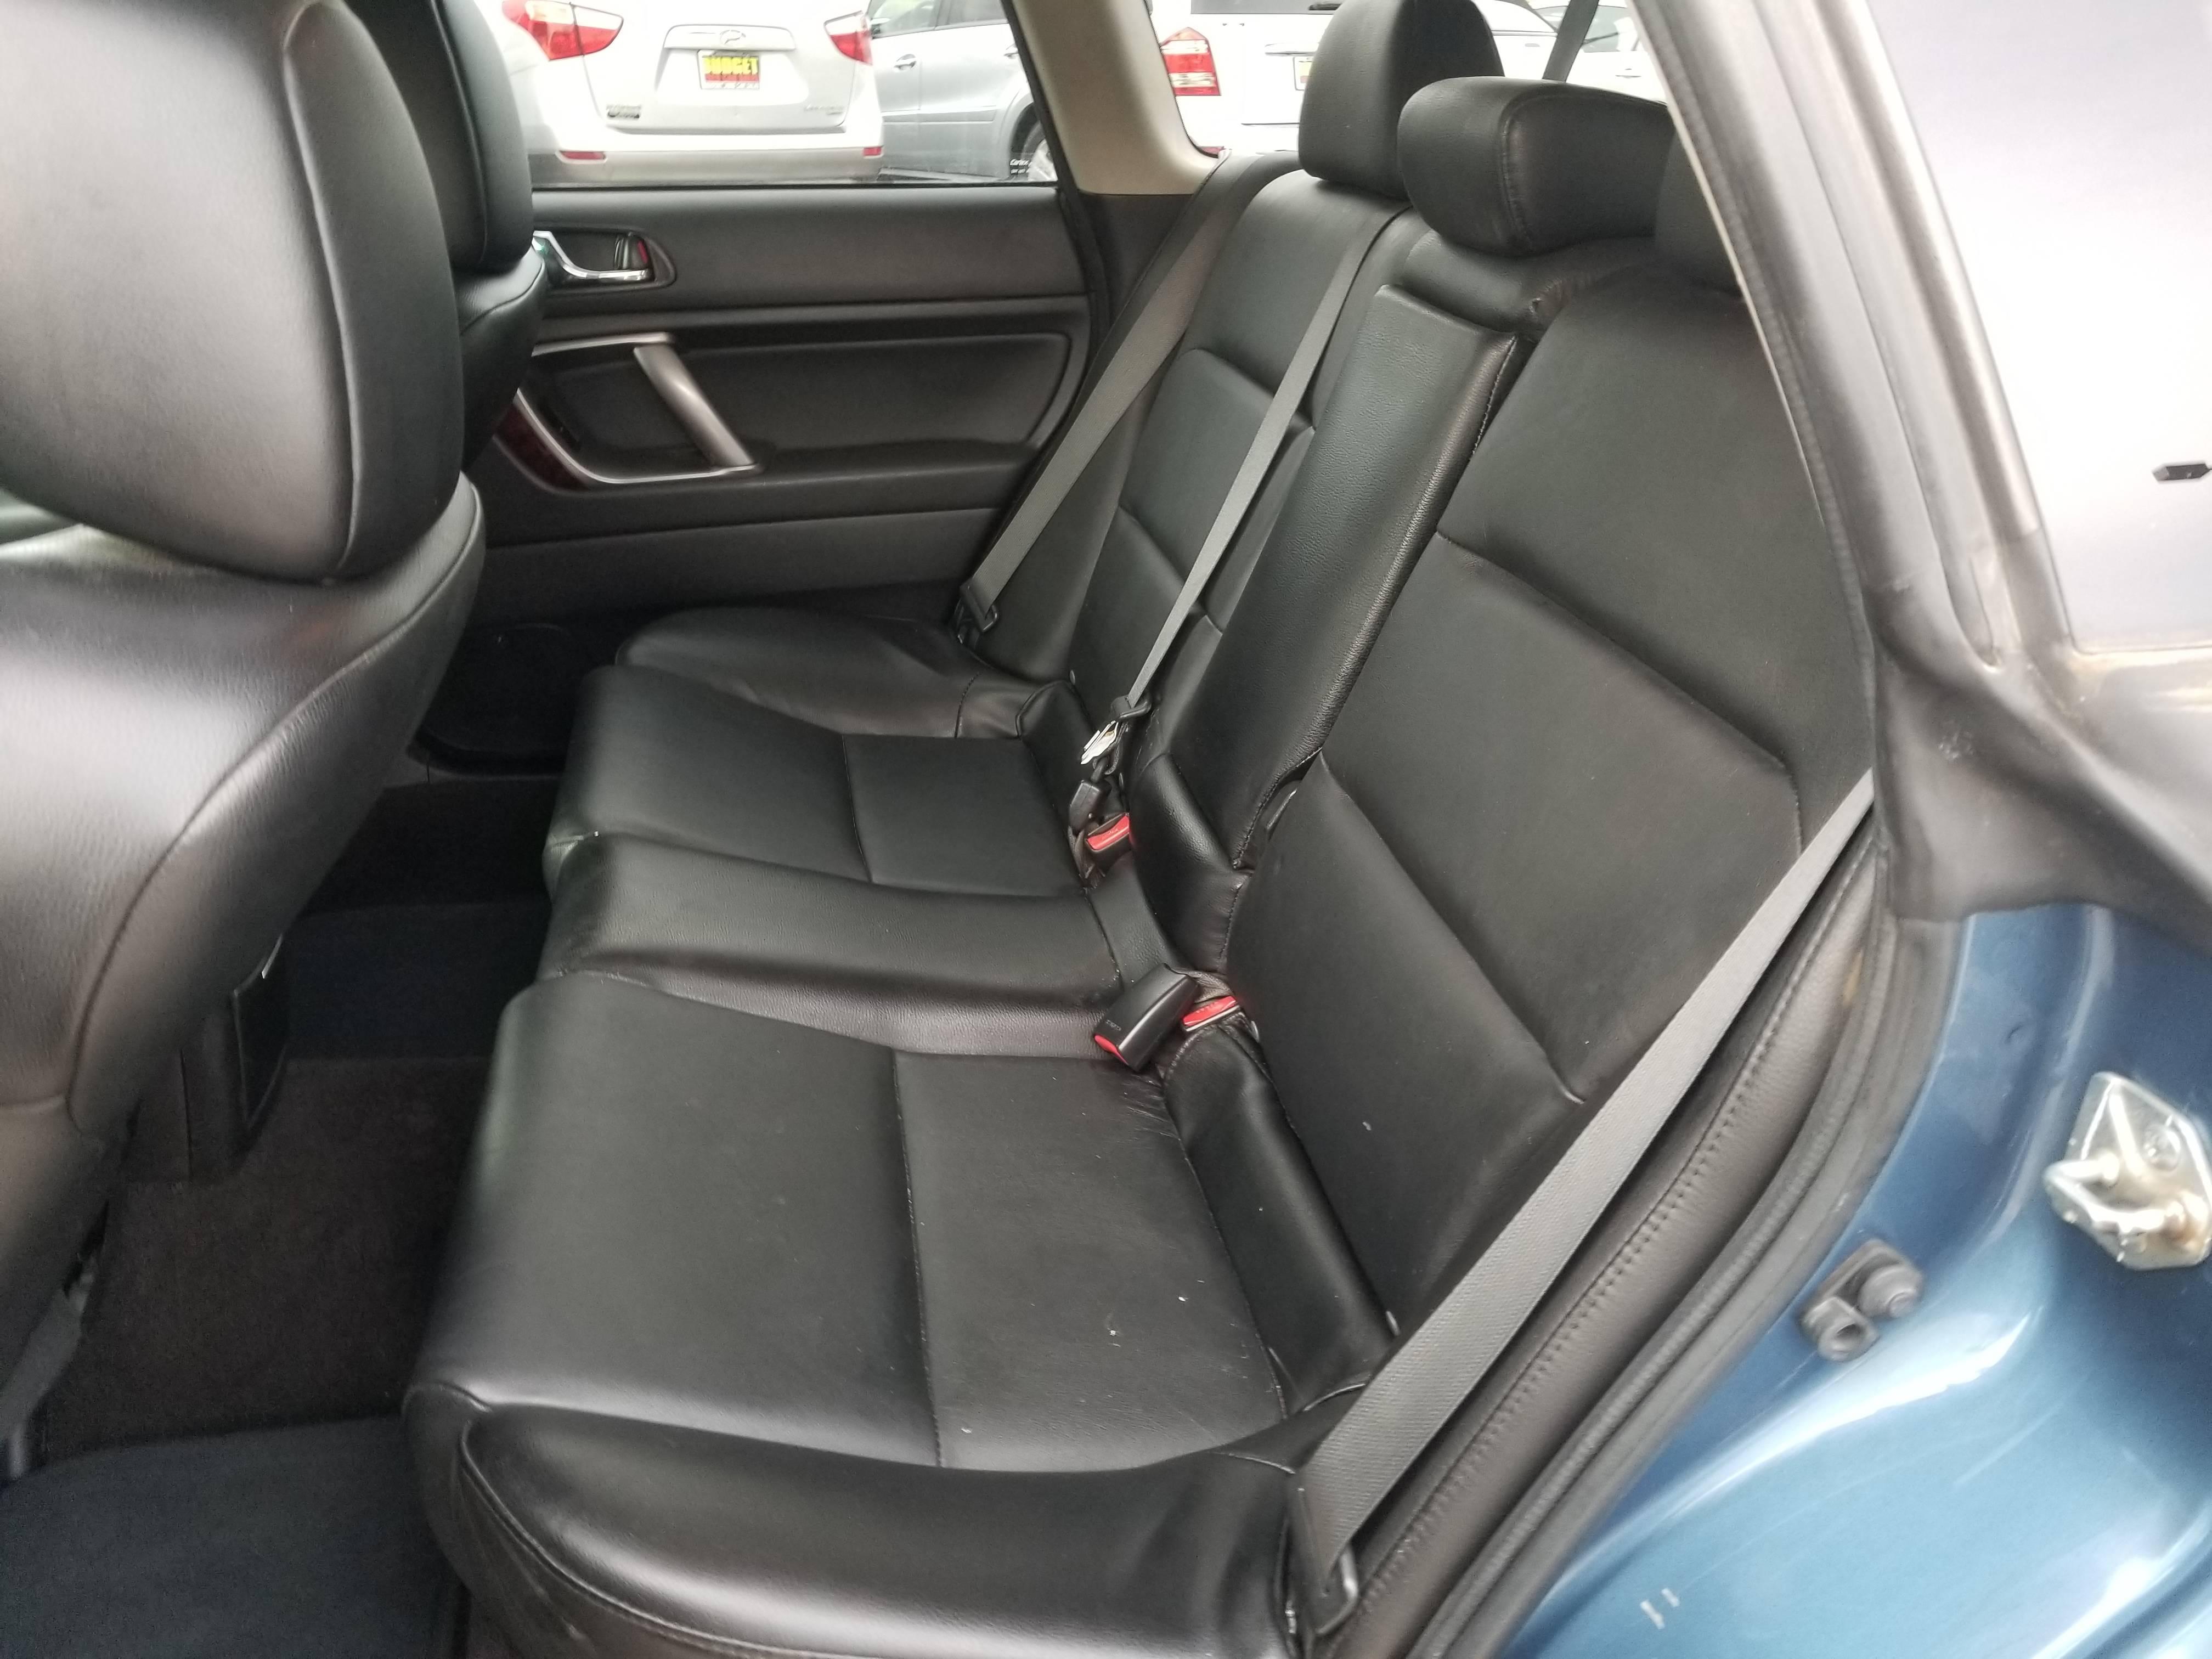 used vehicle - Wagon SUBARU OUTBACK 2009